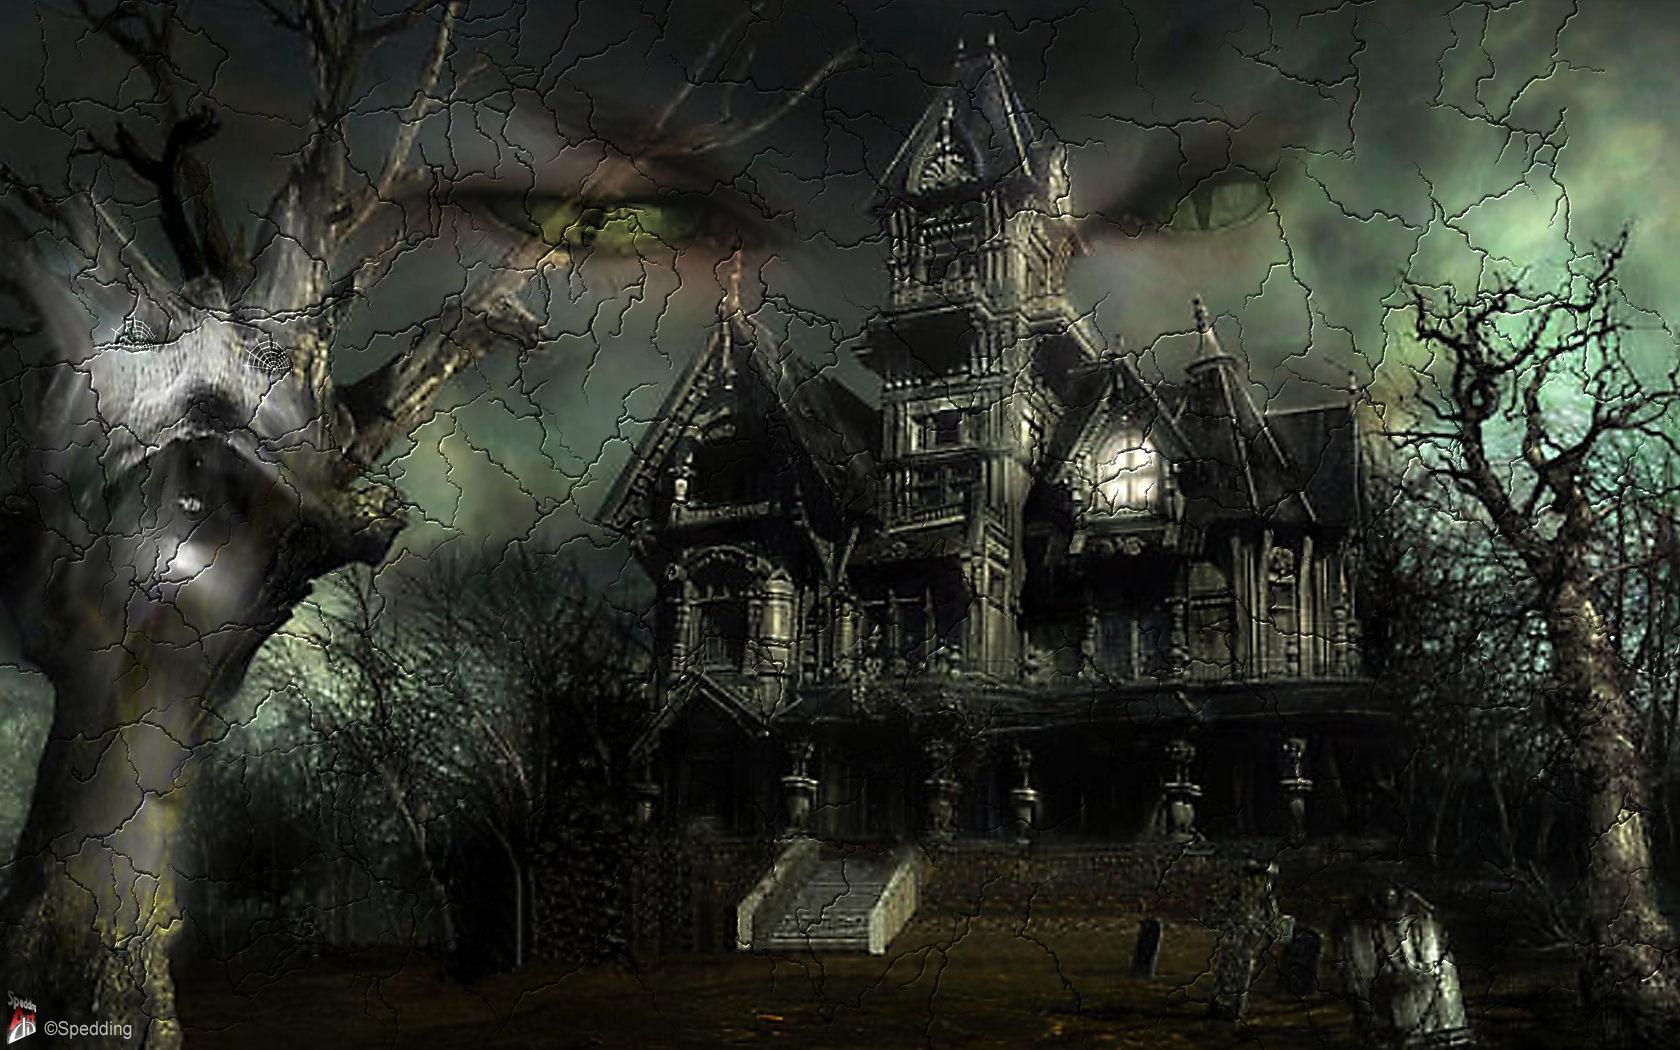 Scary Halloween Image